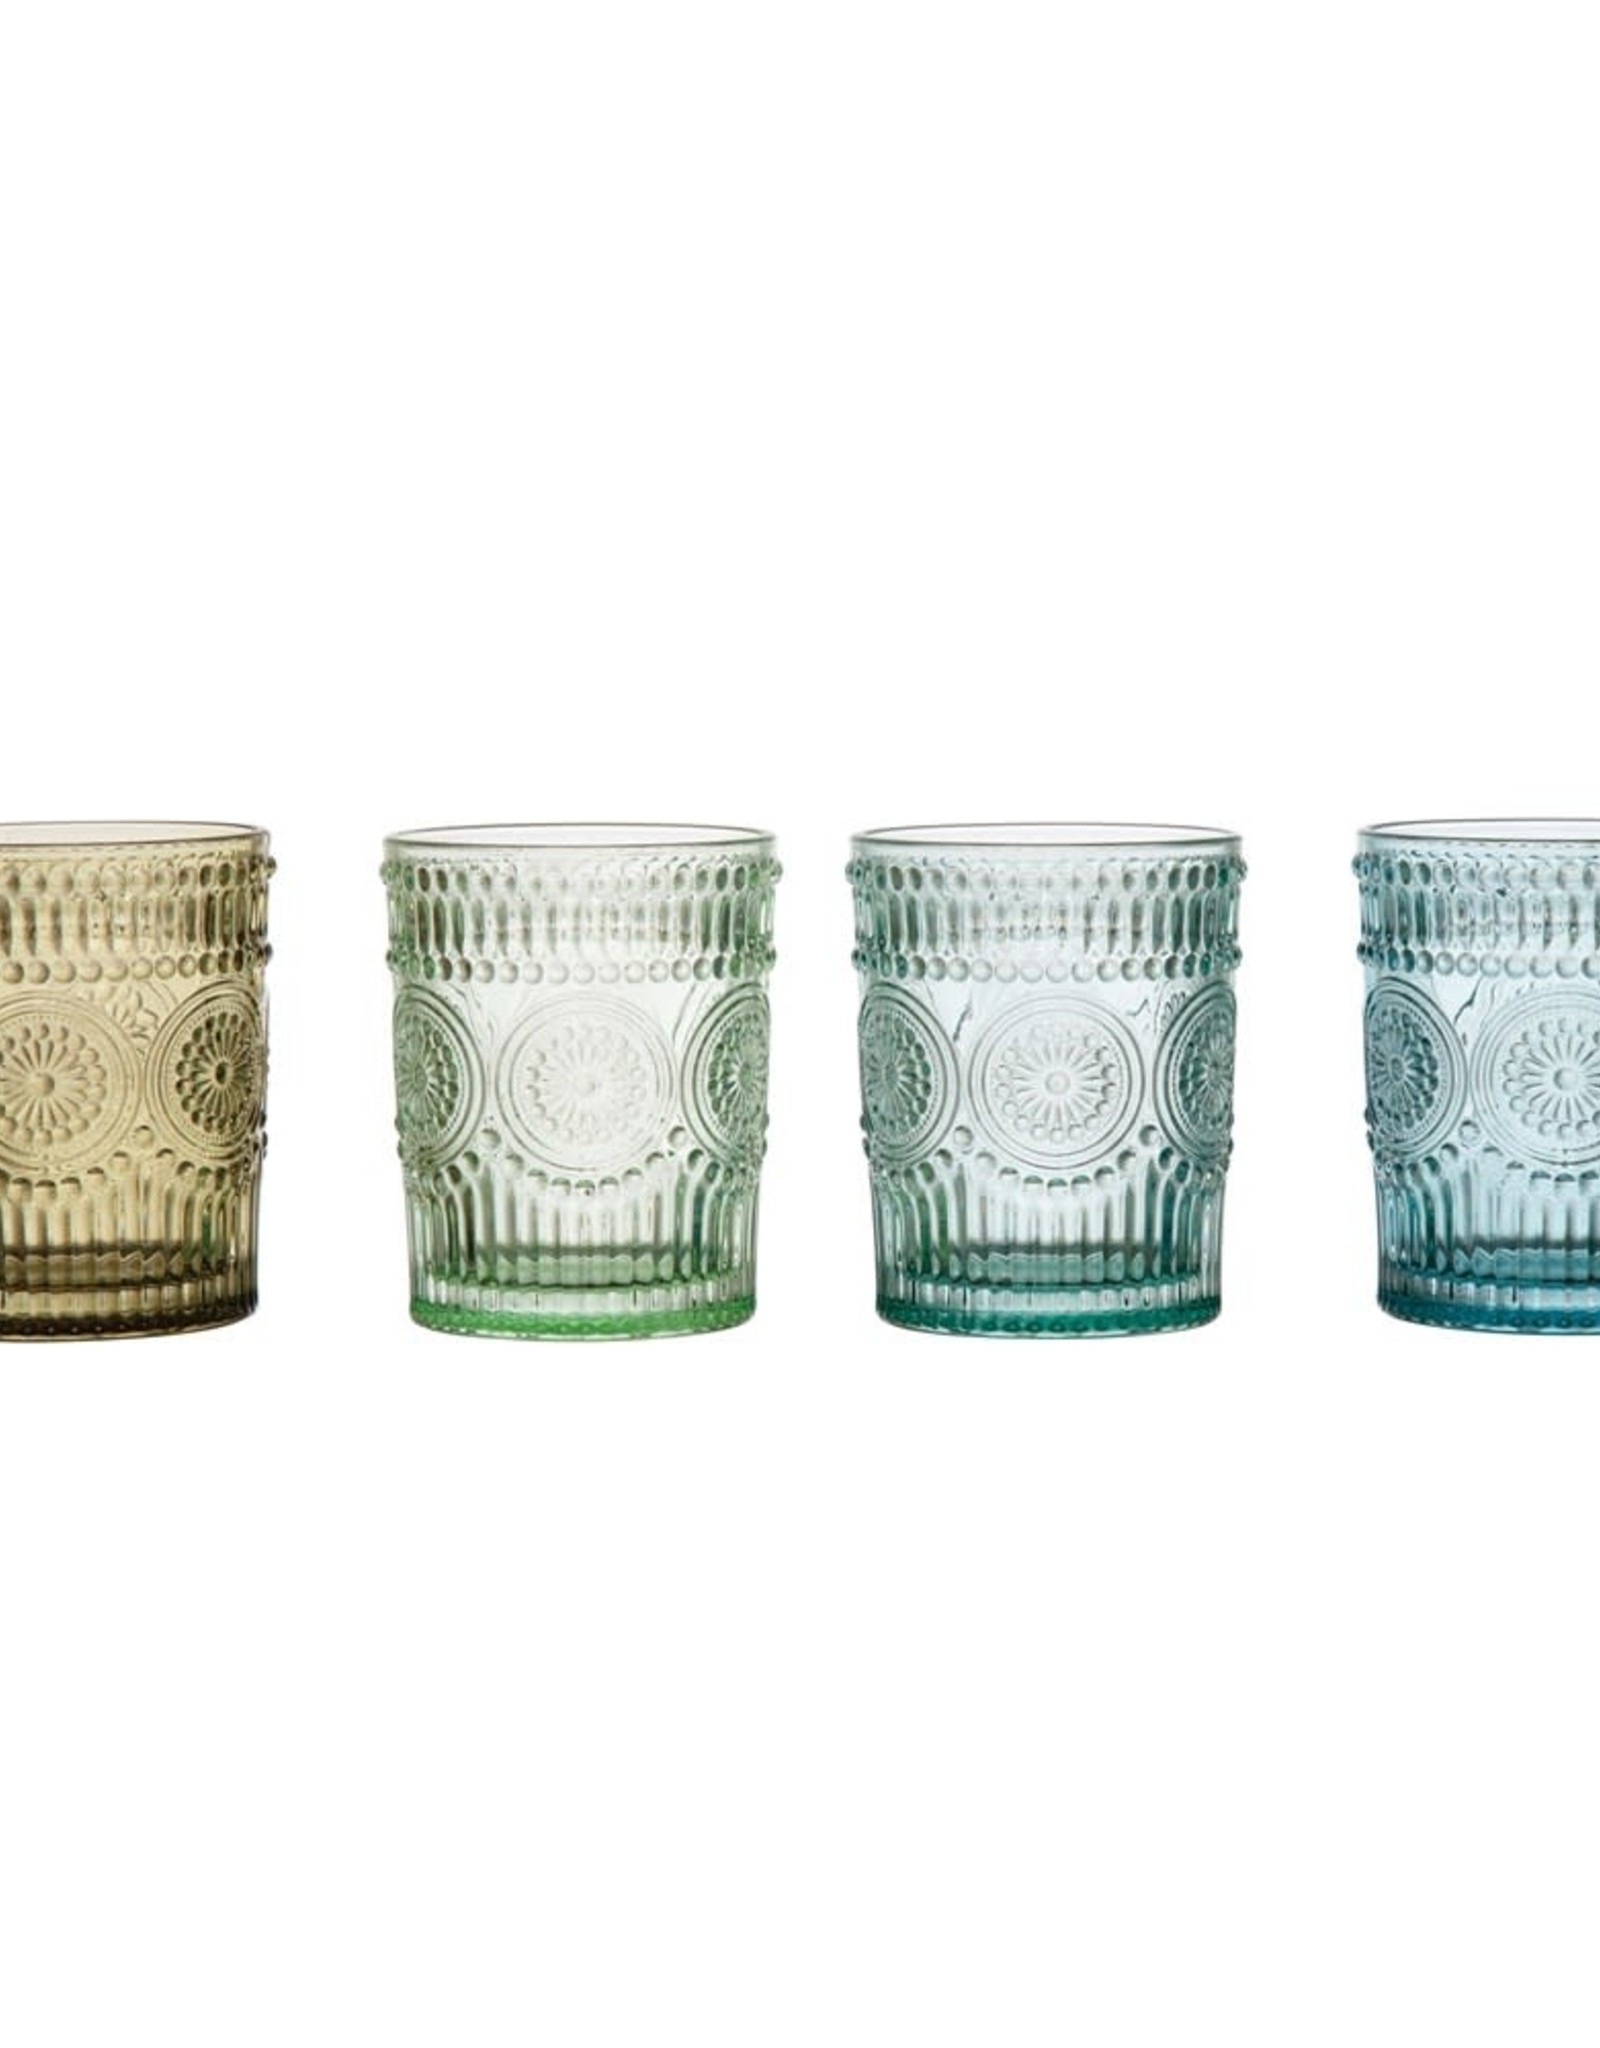 Wink Set of 4 Embossed Drinking Glasses